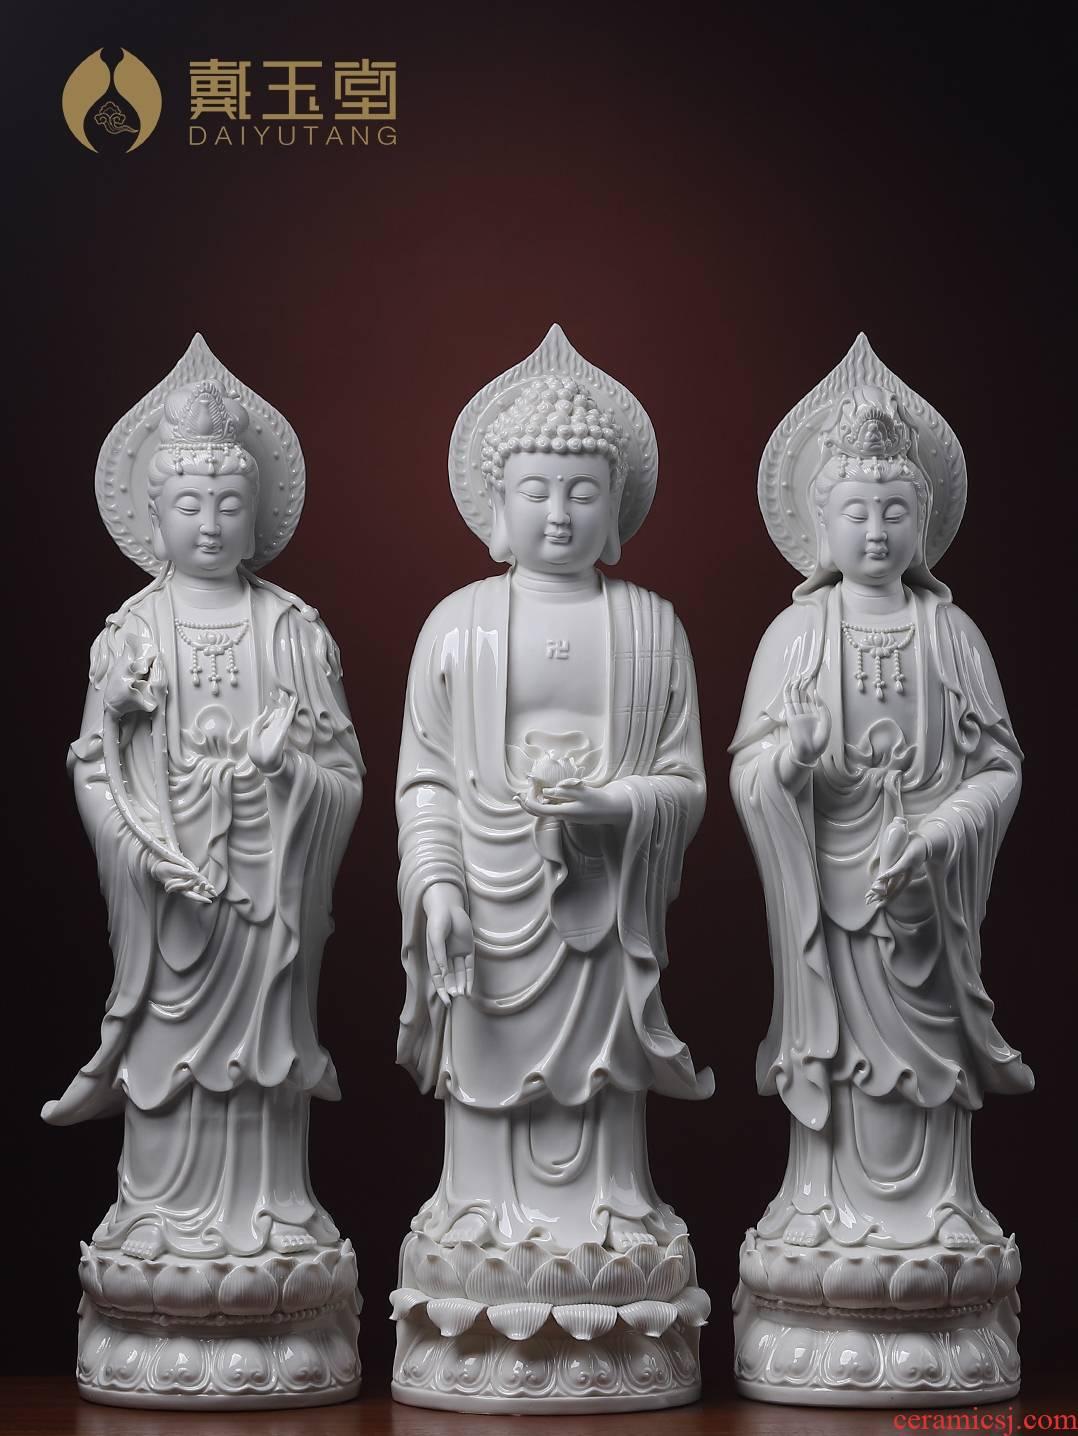 Yutang dai 24 inch ceramic three western spirit as furnishing articles dehua white porcelain guanyin Buddha handicrafts